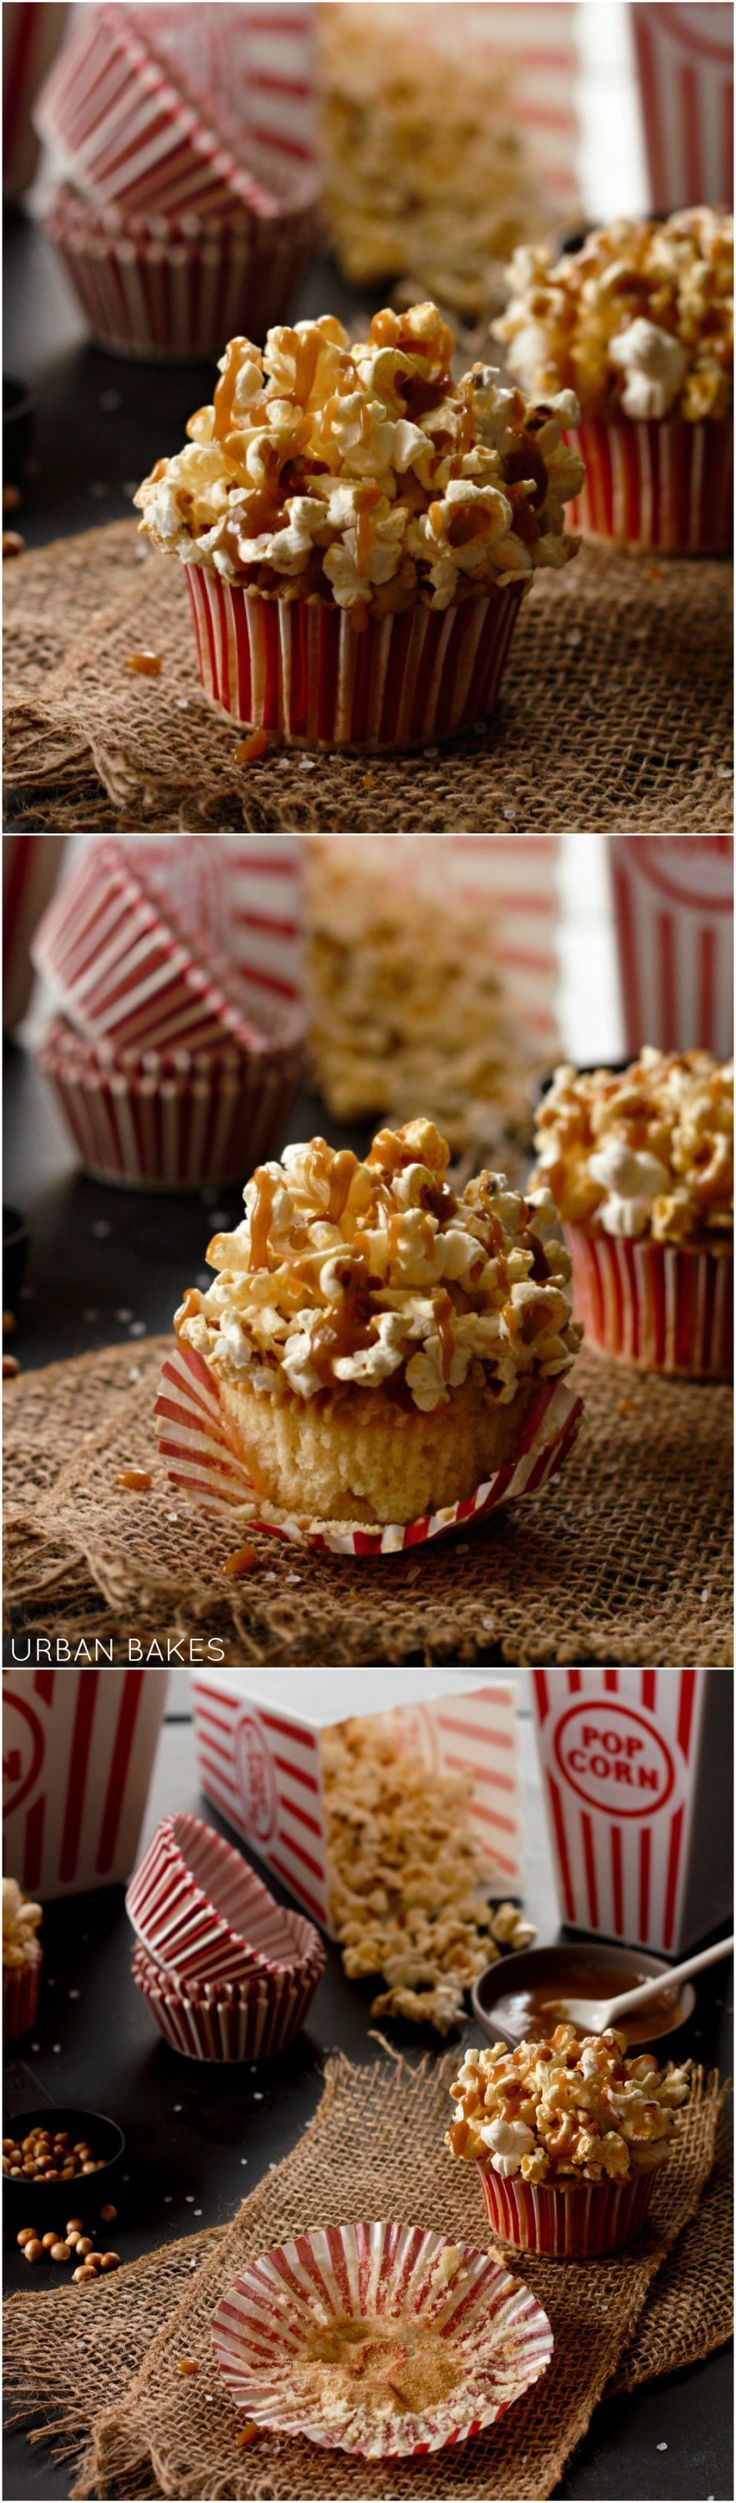 Brown Butter Salted Caramel Popcorn Cupcakes | http://urbanbakes.com